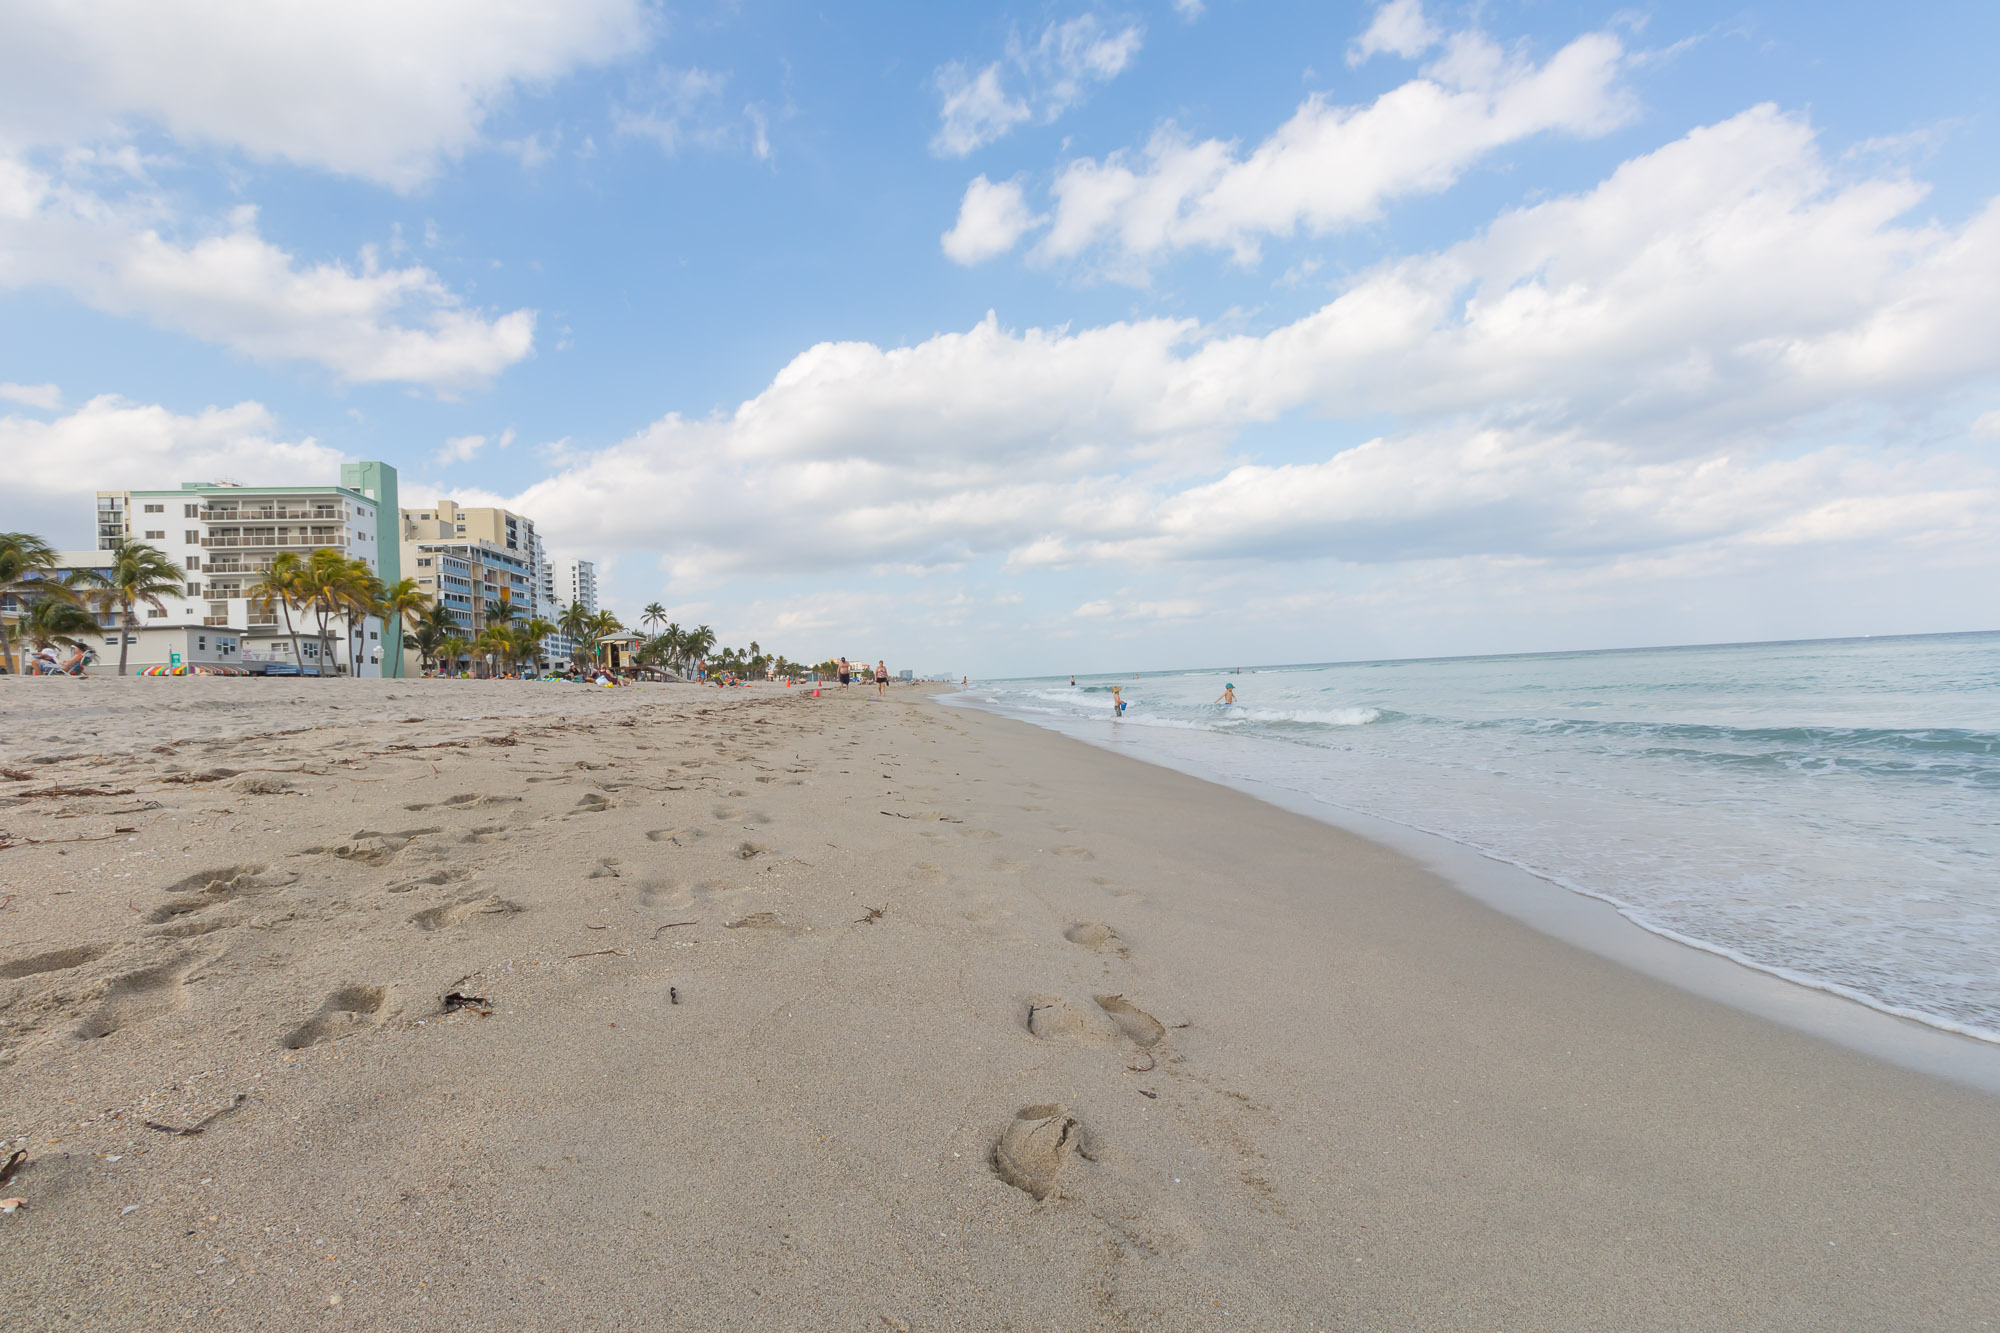 532 Ocean View Hollywood Beach Resort photo 18624017